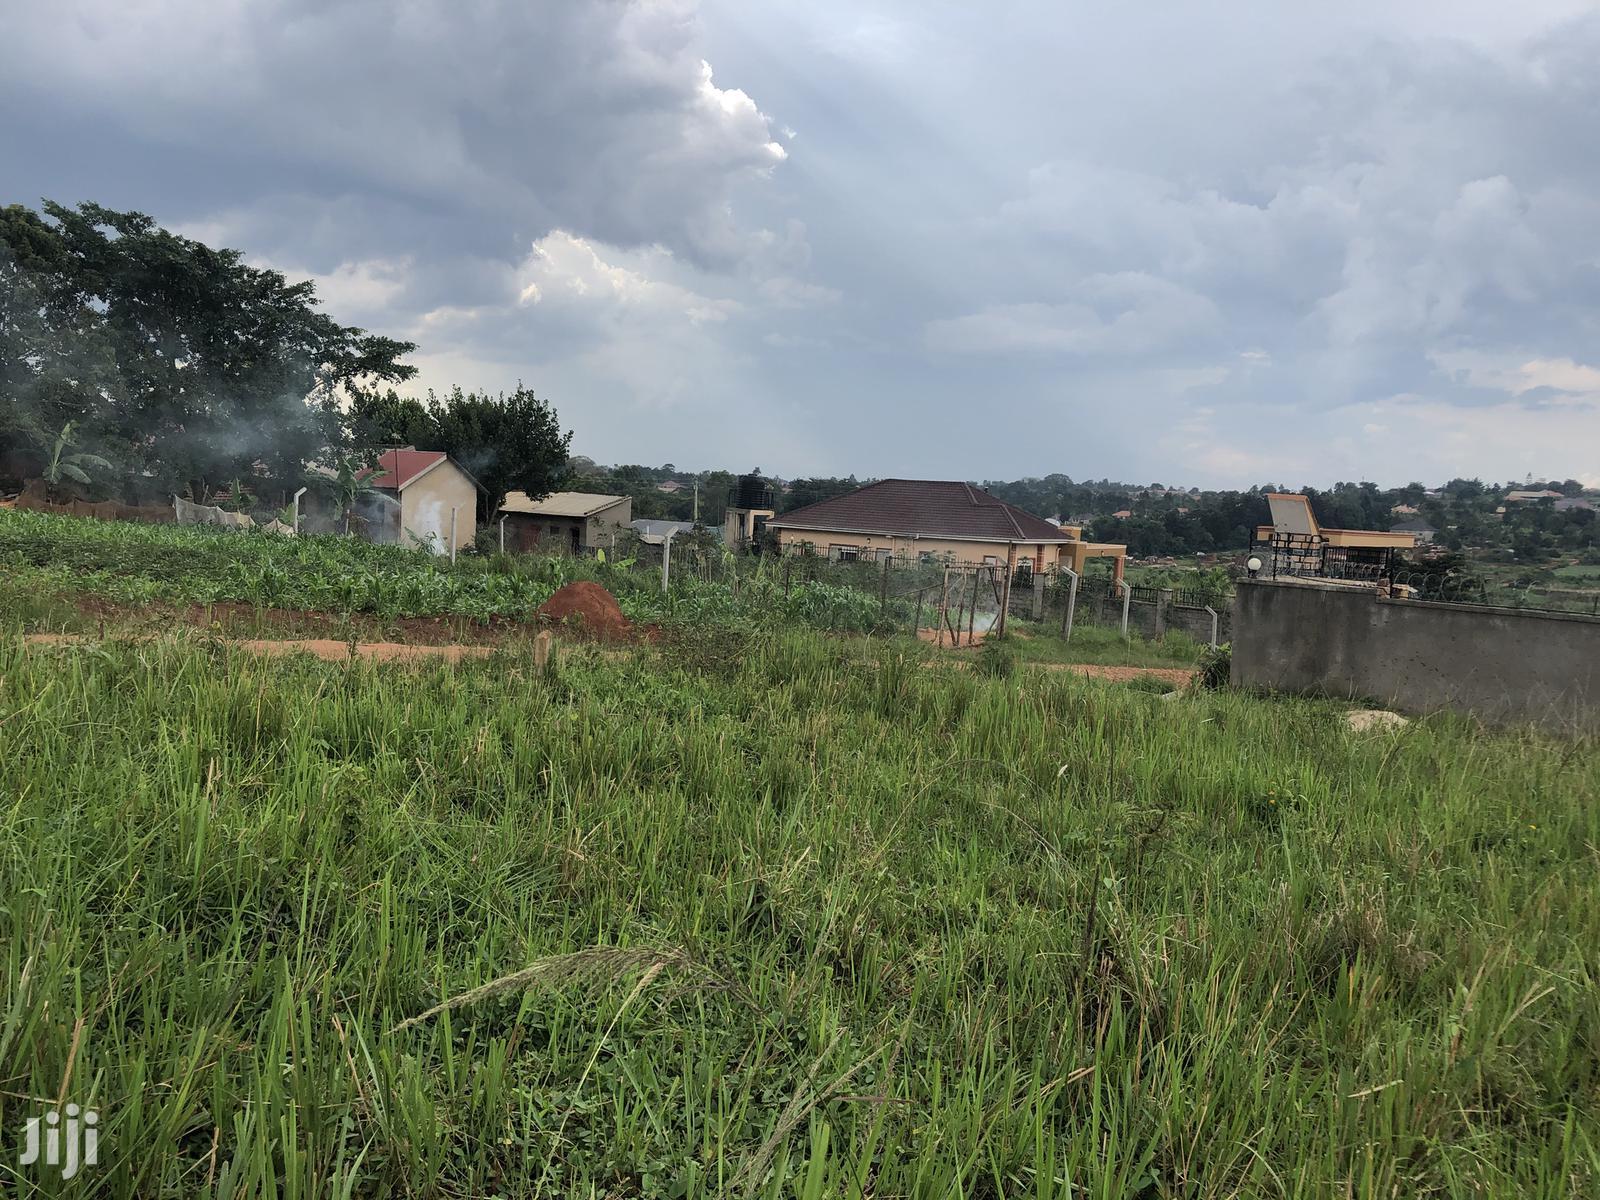 Kira Affordable Plot Near Tarmack on Sell | Land & Plots For Sale for sale in Kampala, Central Region, Uganda